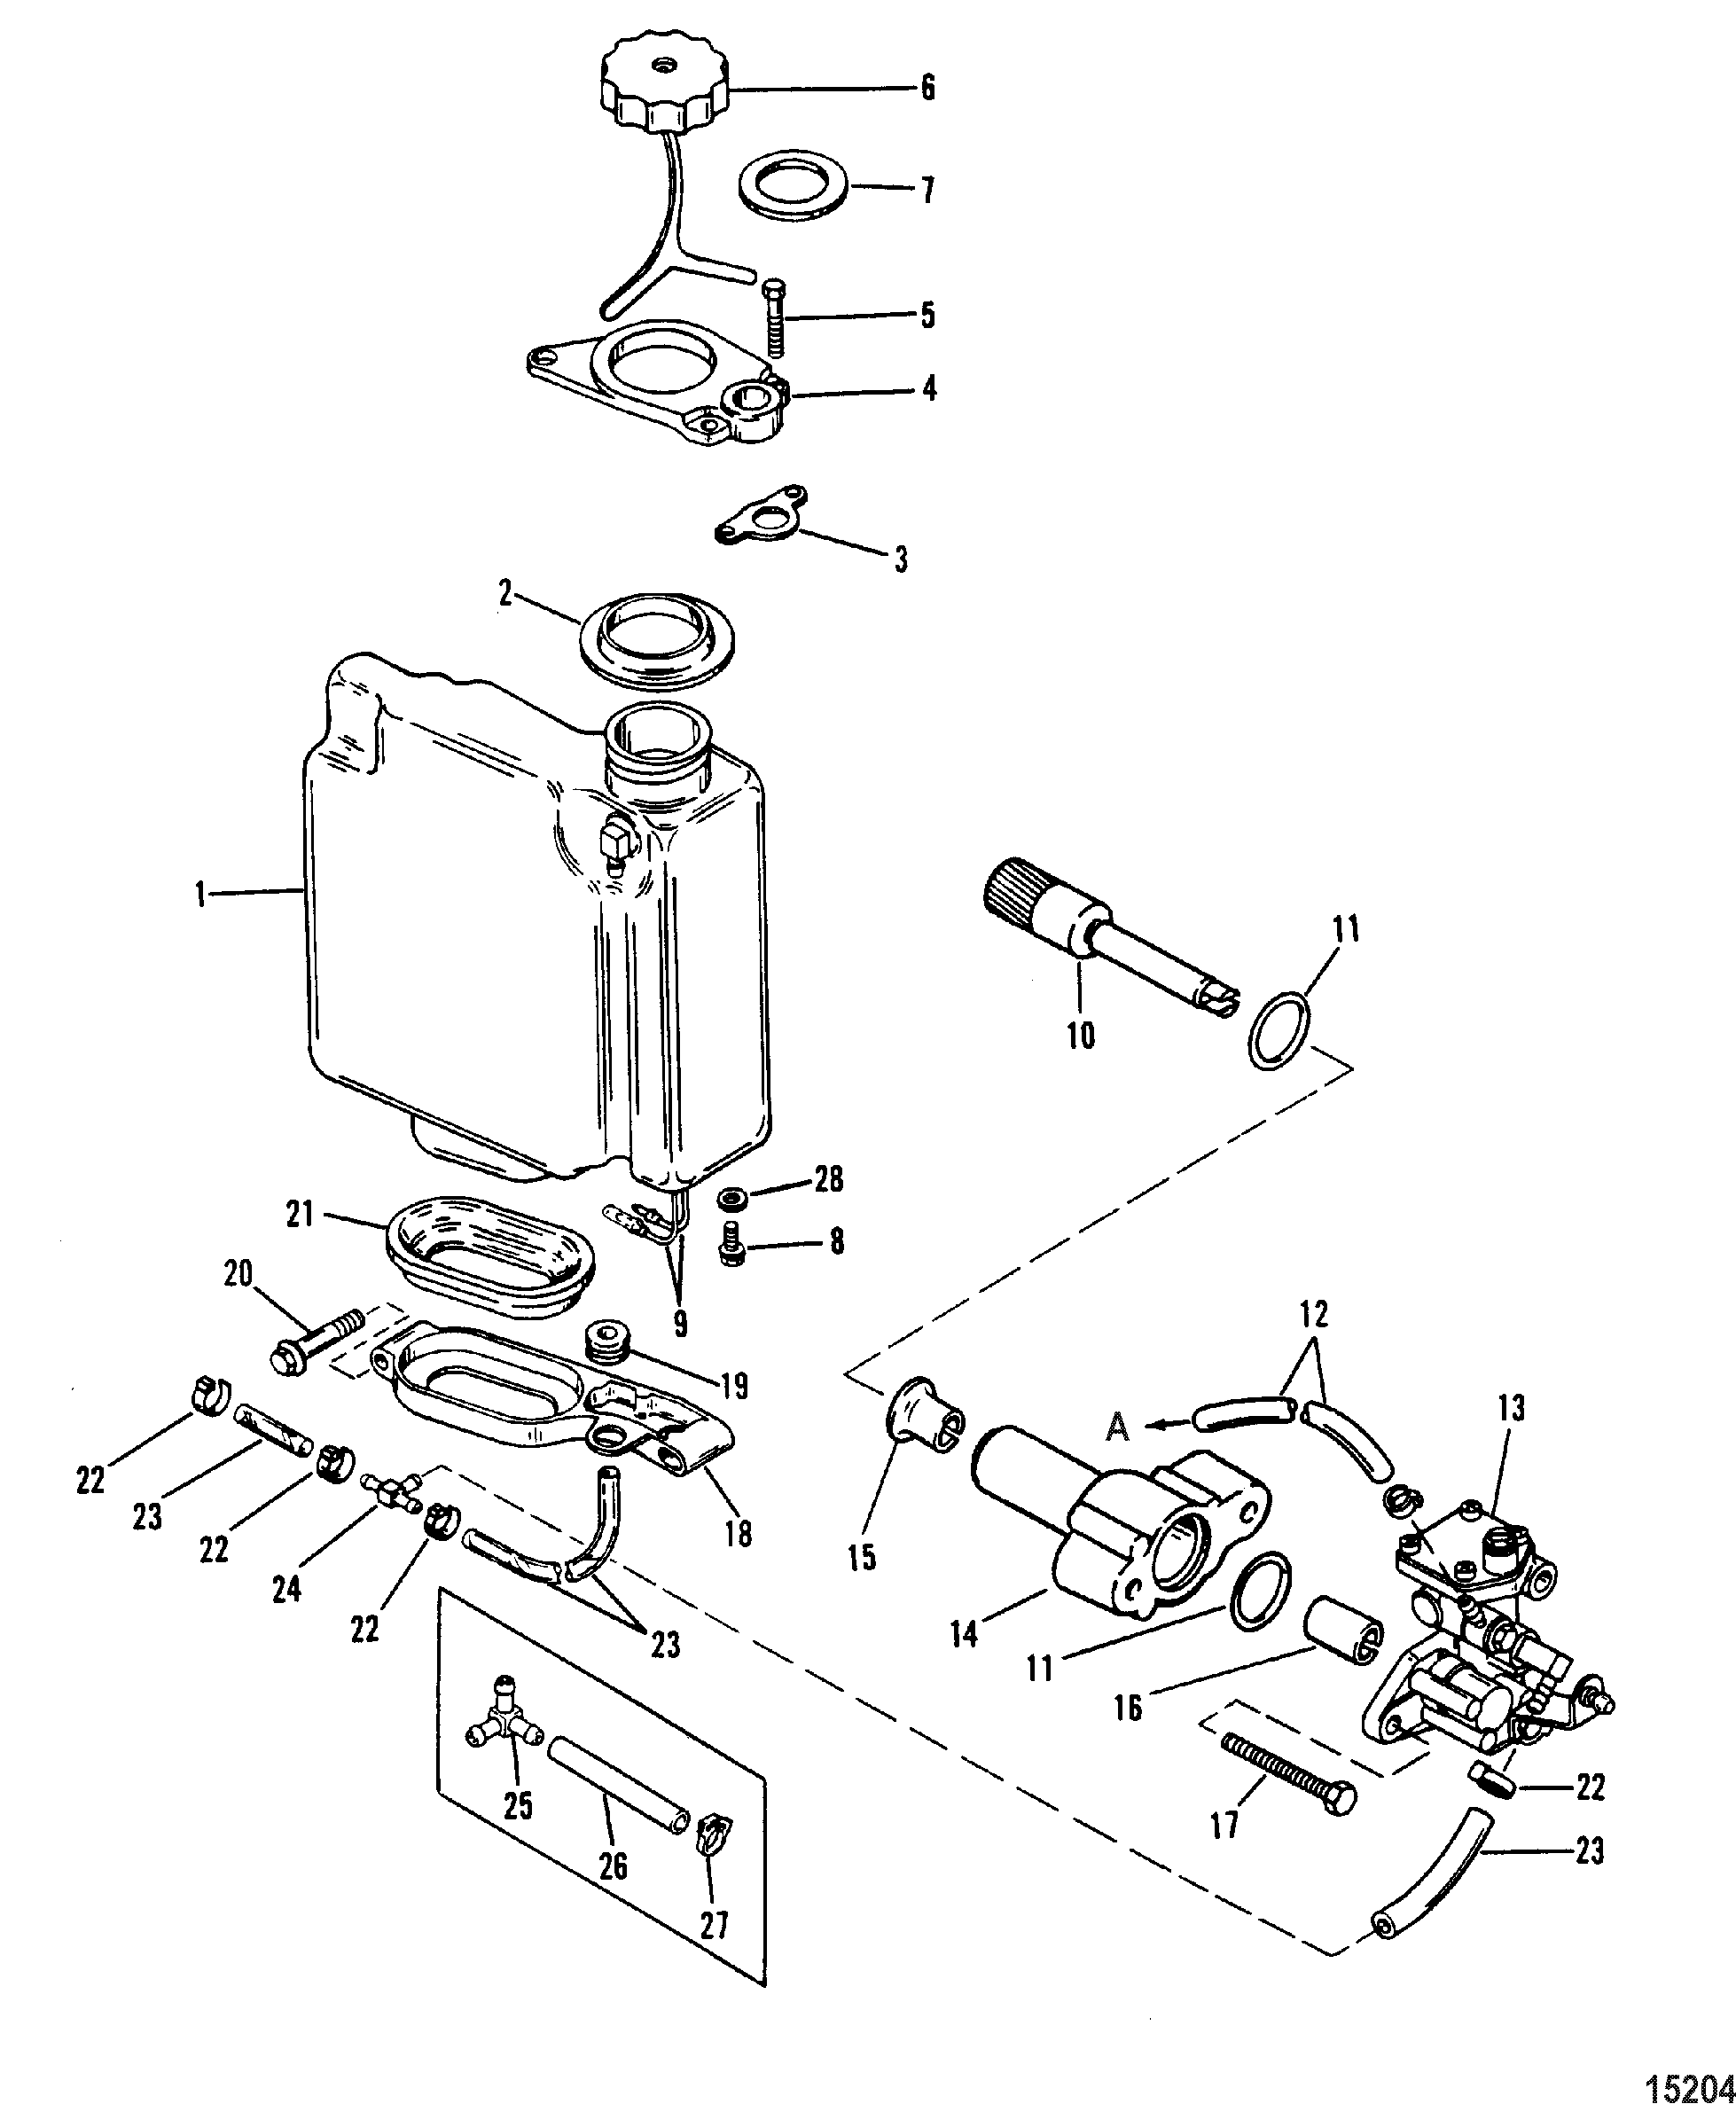 15204?resize\\\\\=665%2C806\\\\\&ssl\\\\\=1 yamaha outboard wiring diagram dexter wiring diagram, yamaha golf yamaha 115 outboard wiring diagram at mifinder.co